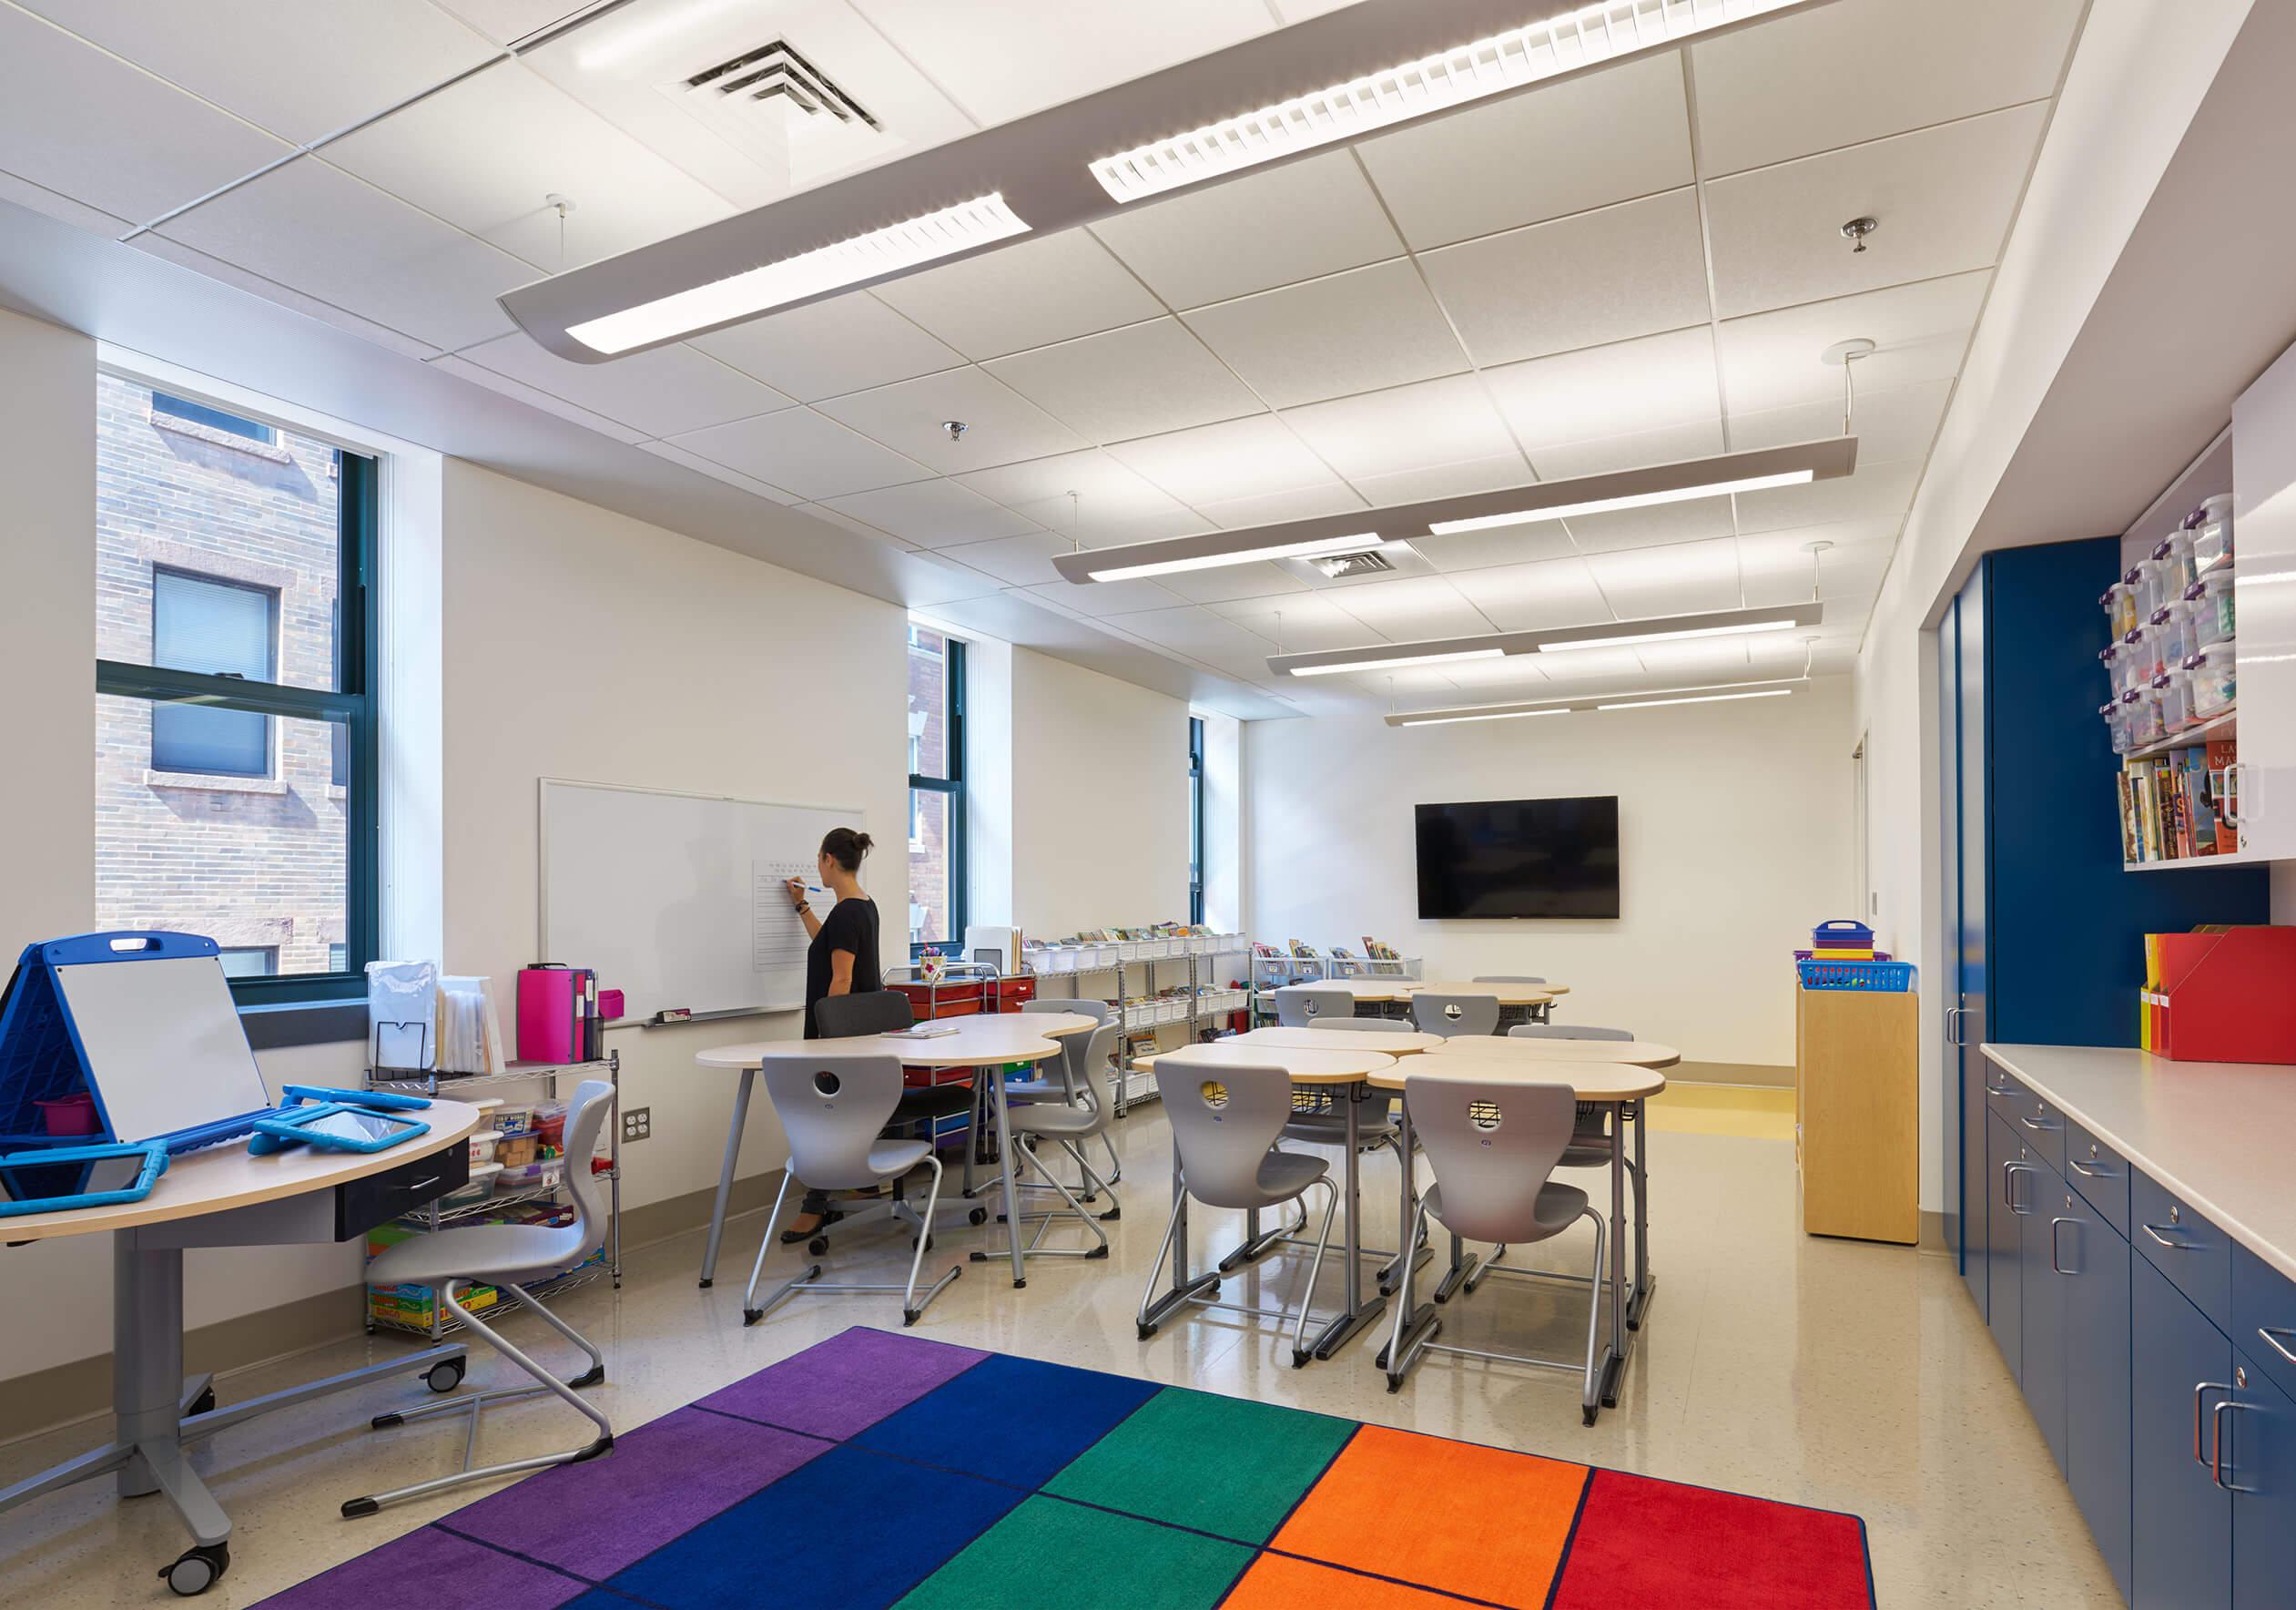 Rainbow rug, with desks in classroom teacher writing on whiteboard.